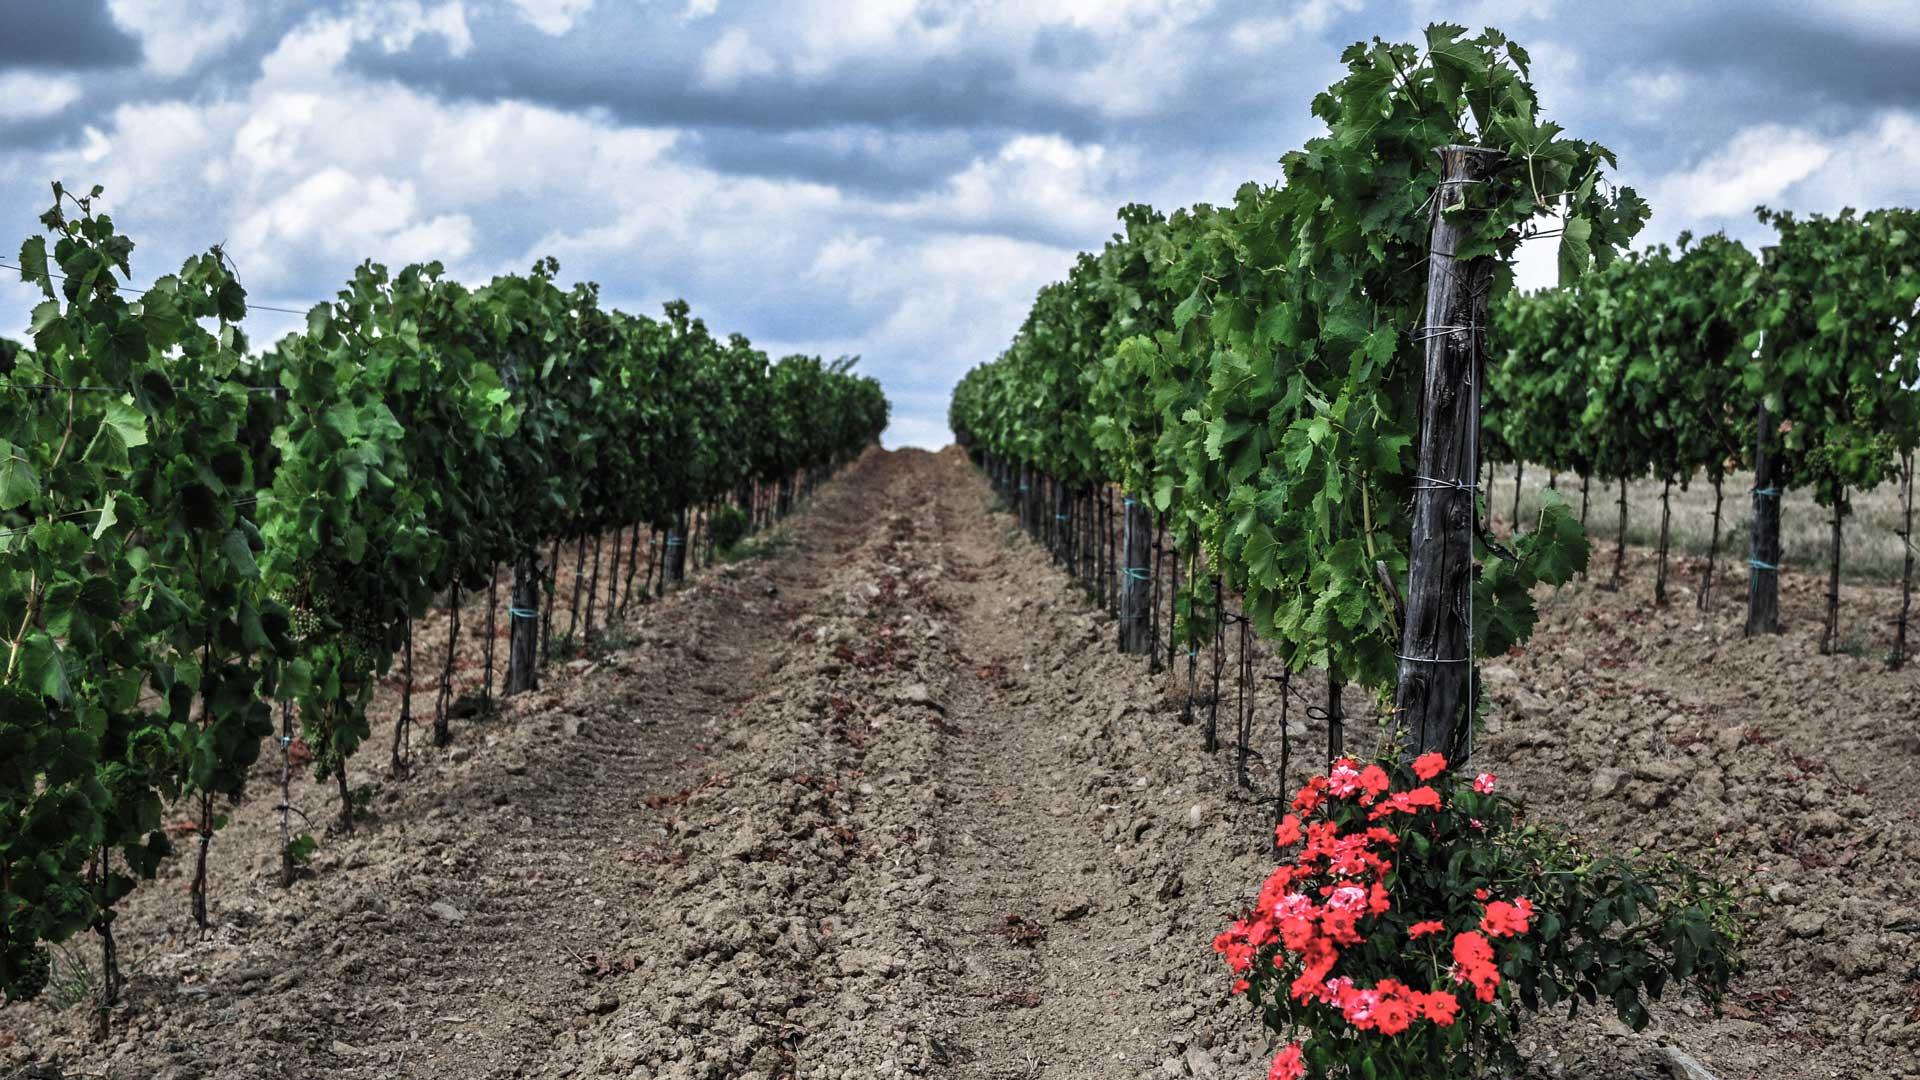 Copy of Vineyards in Spring